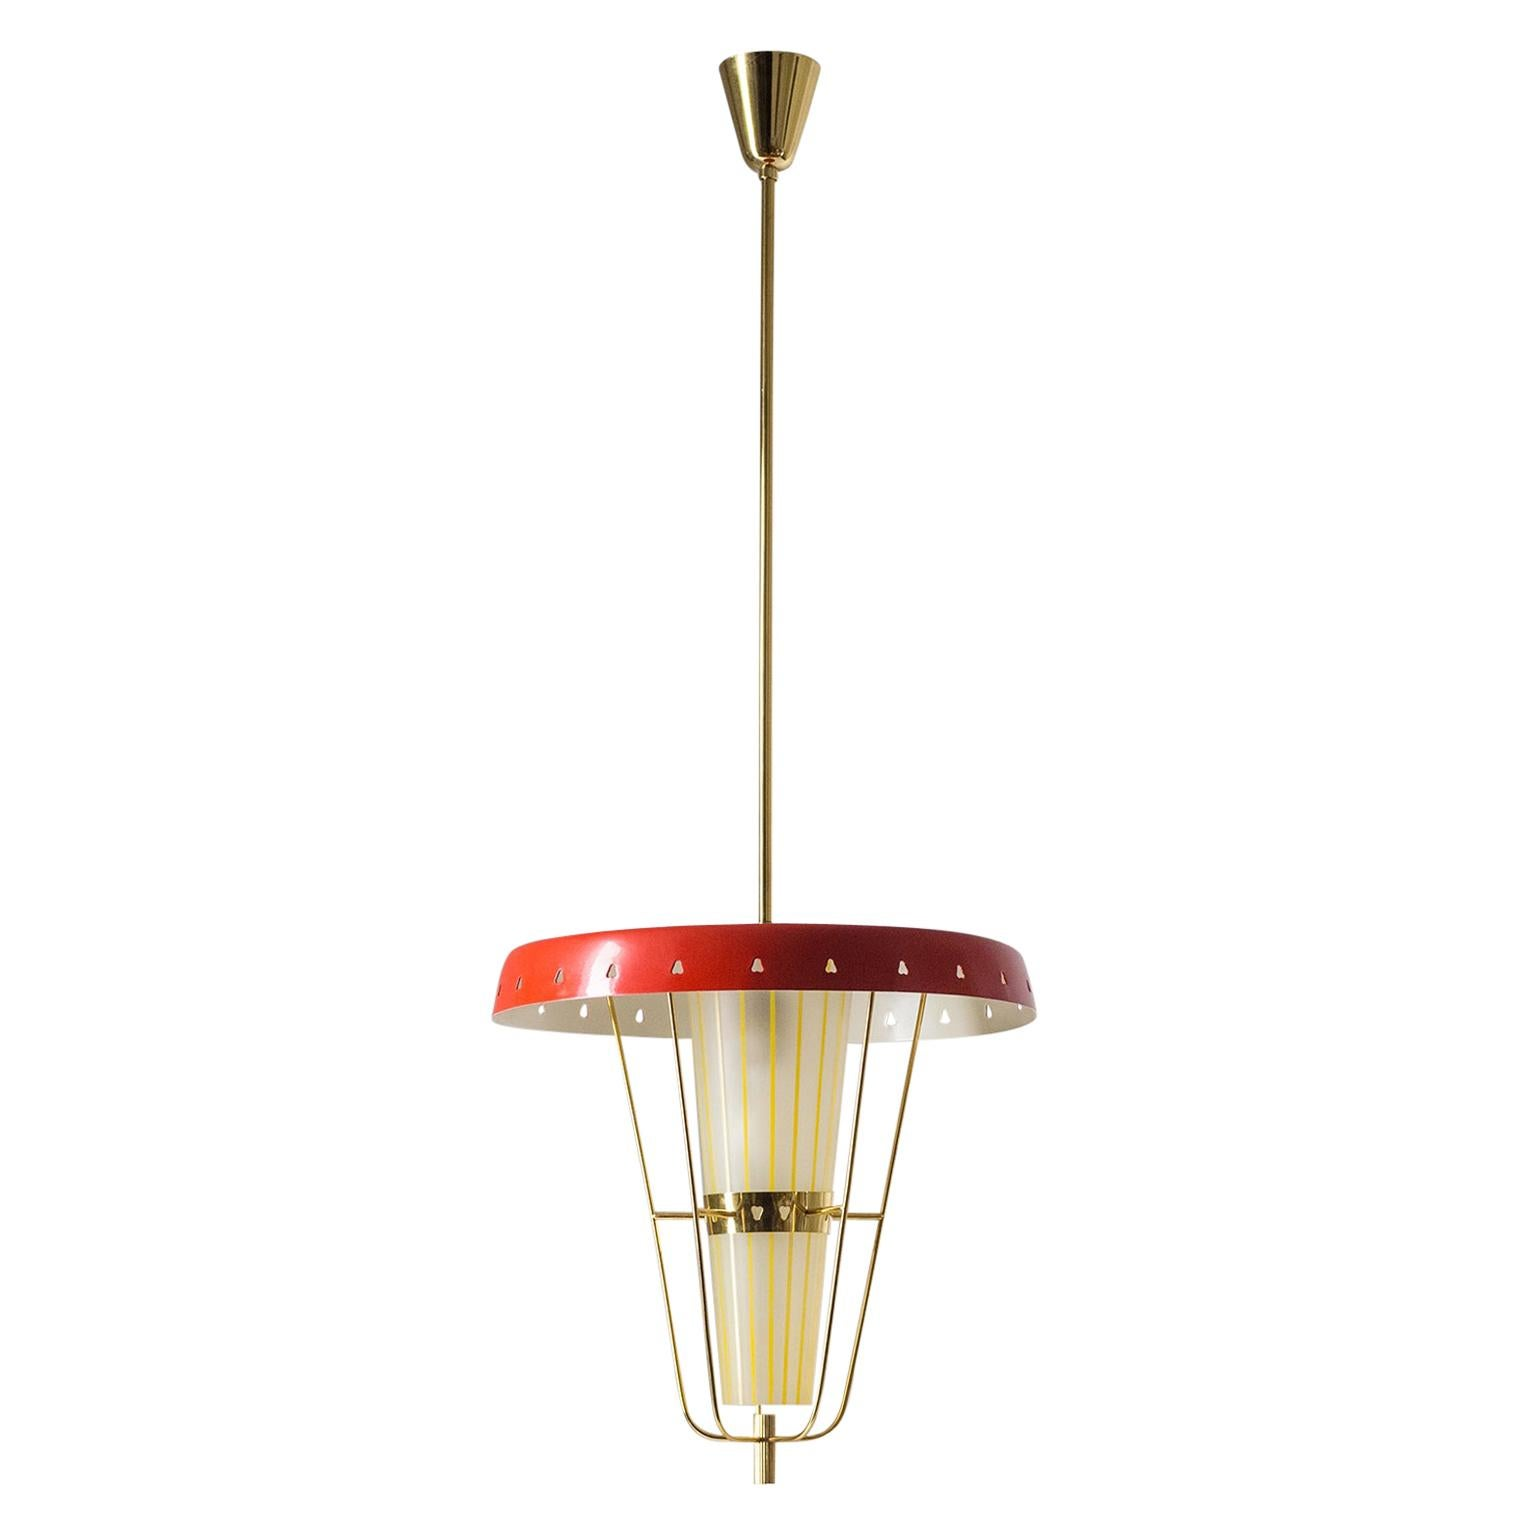 Italian 1950s Red Lantern, Brass and Striped Glass